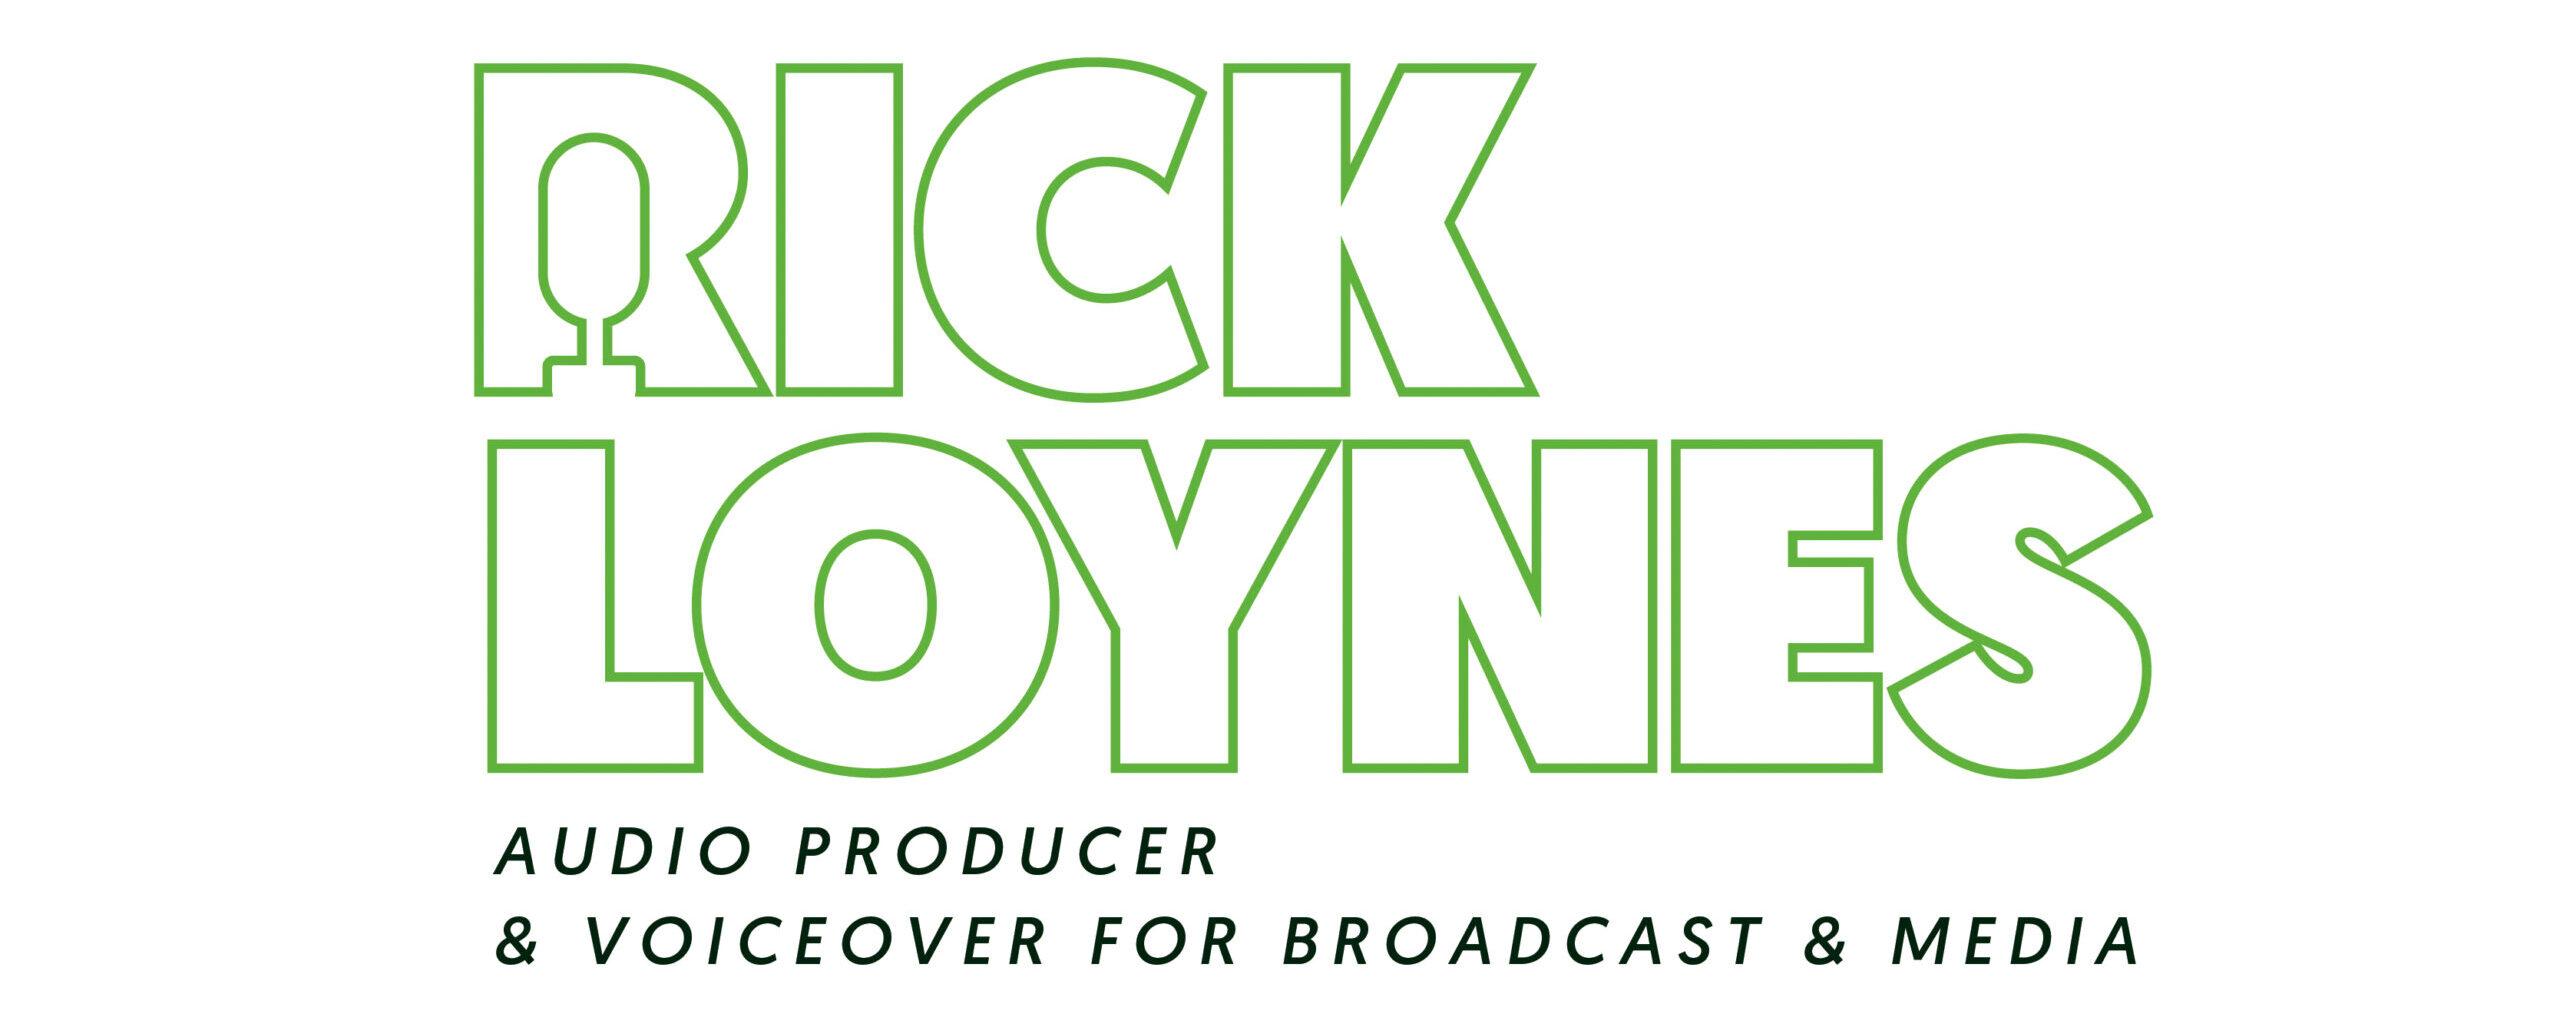 Rick Loynes   Audio Production & Voiceover